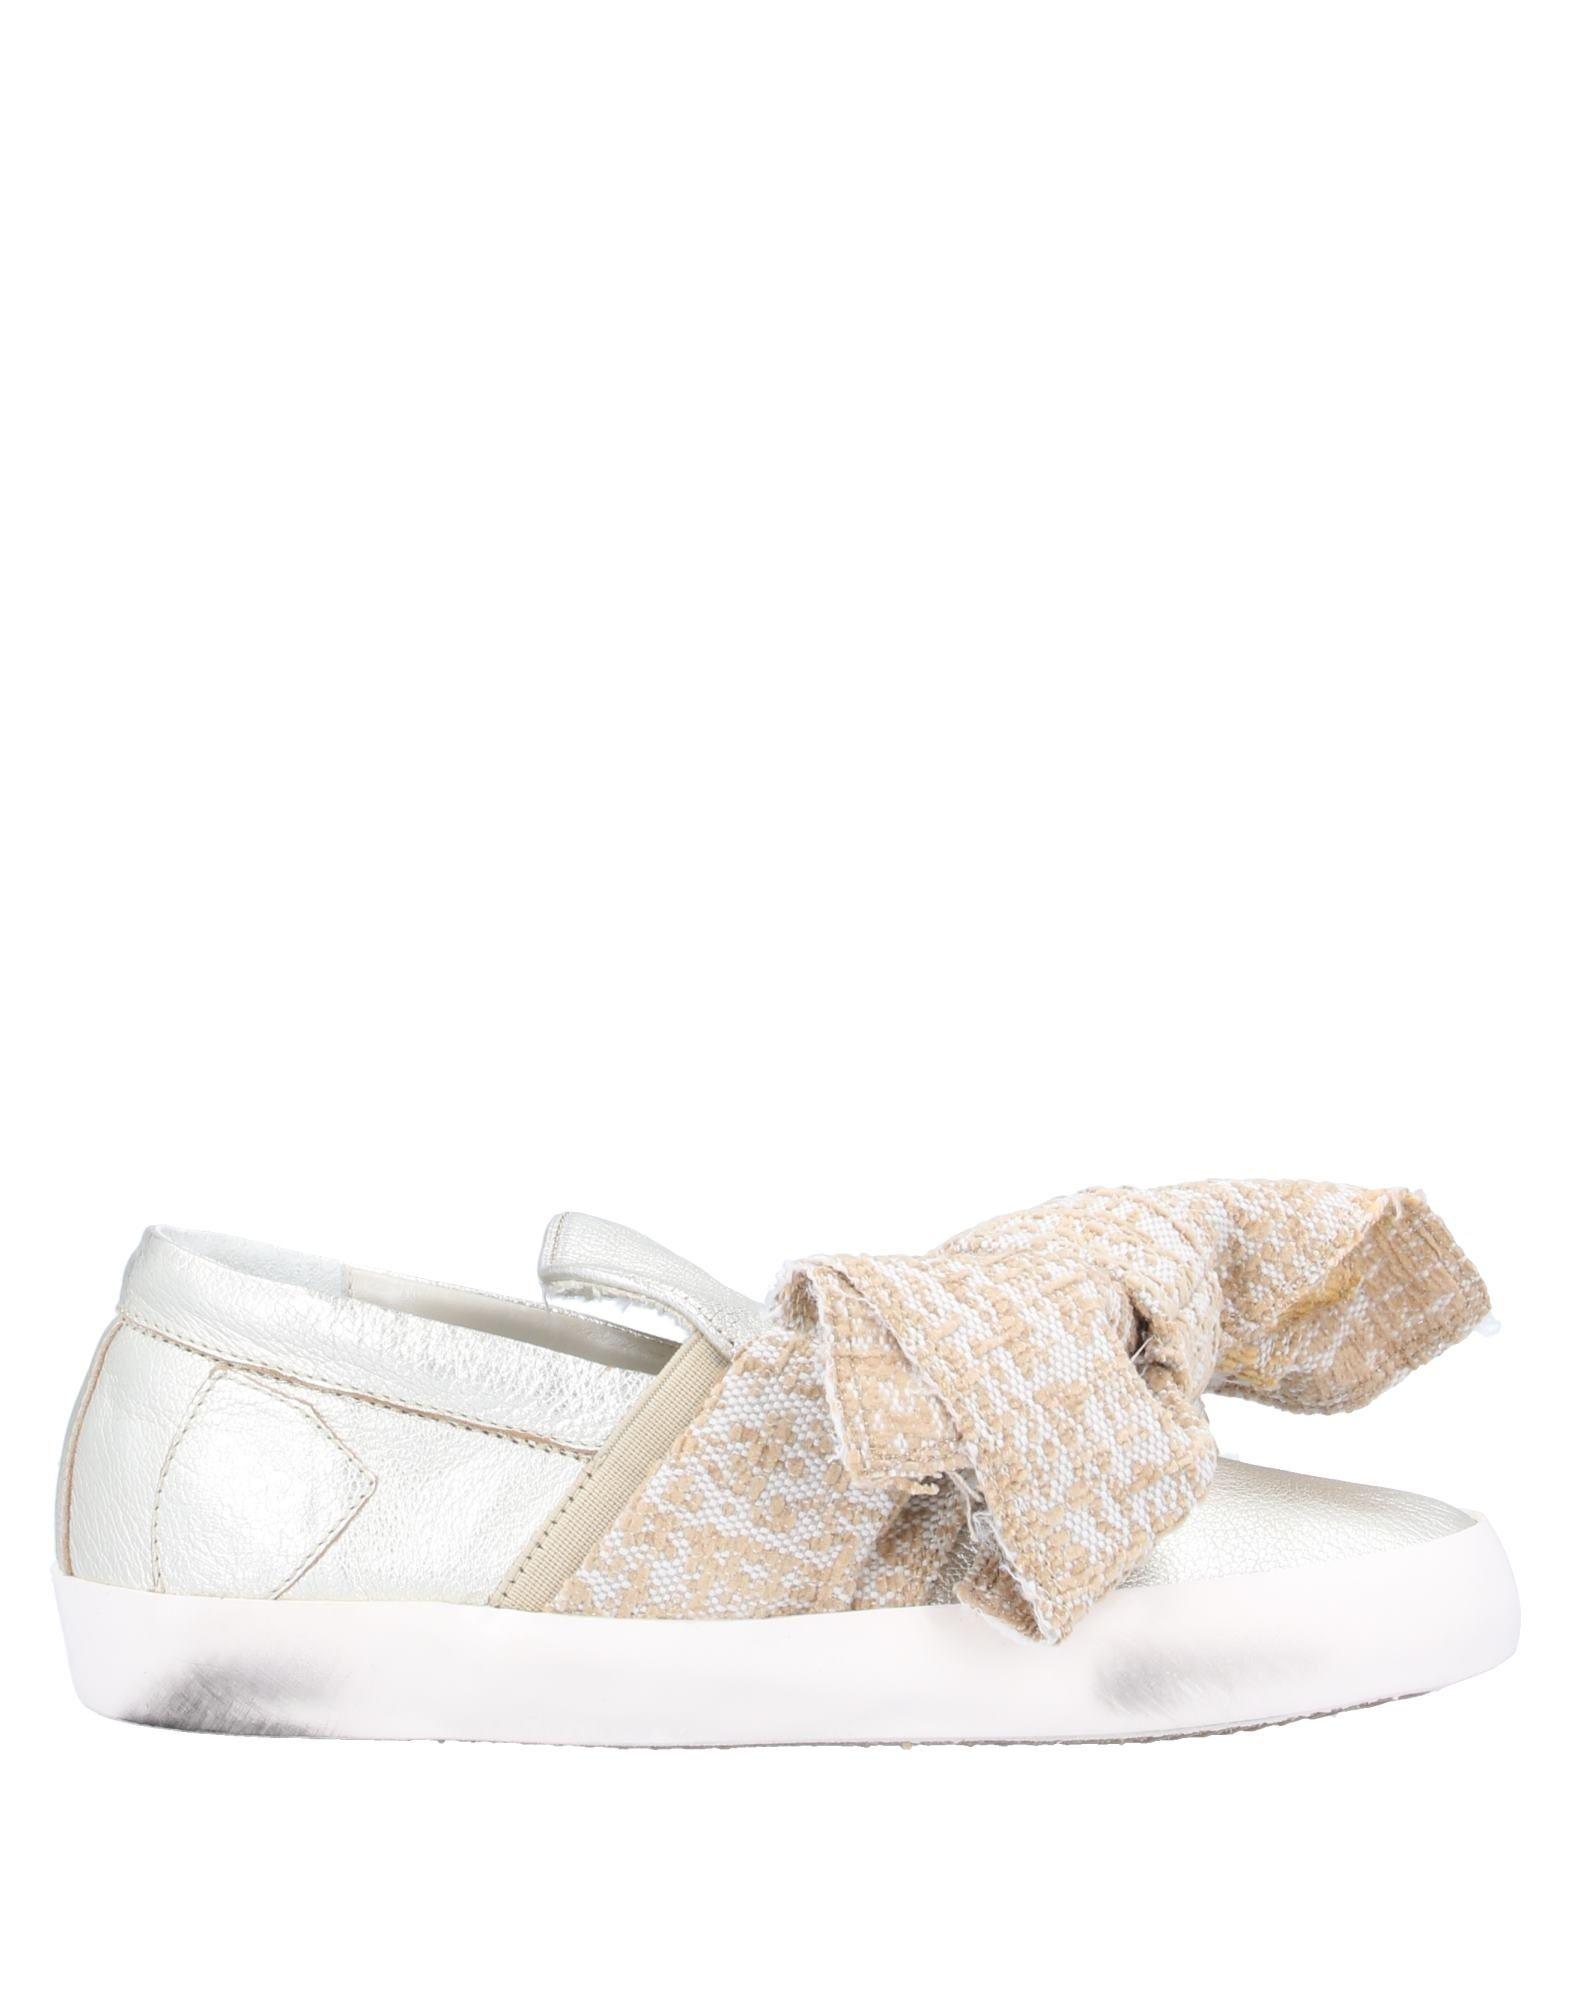 Фото - PHILIPPE MODEL Низкие кеды и кроссовки philippe model низкие кеды и кроссовки